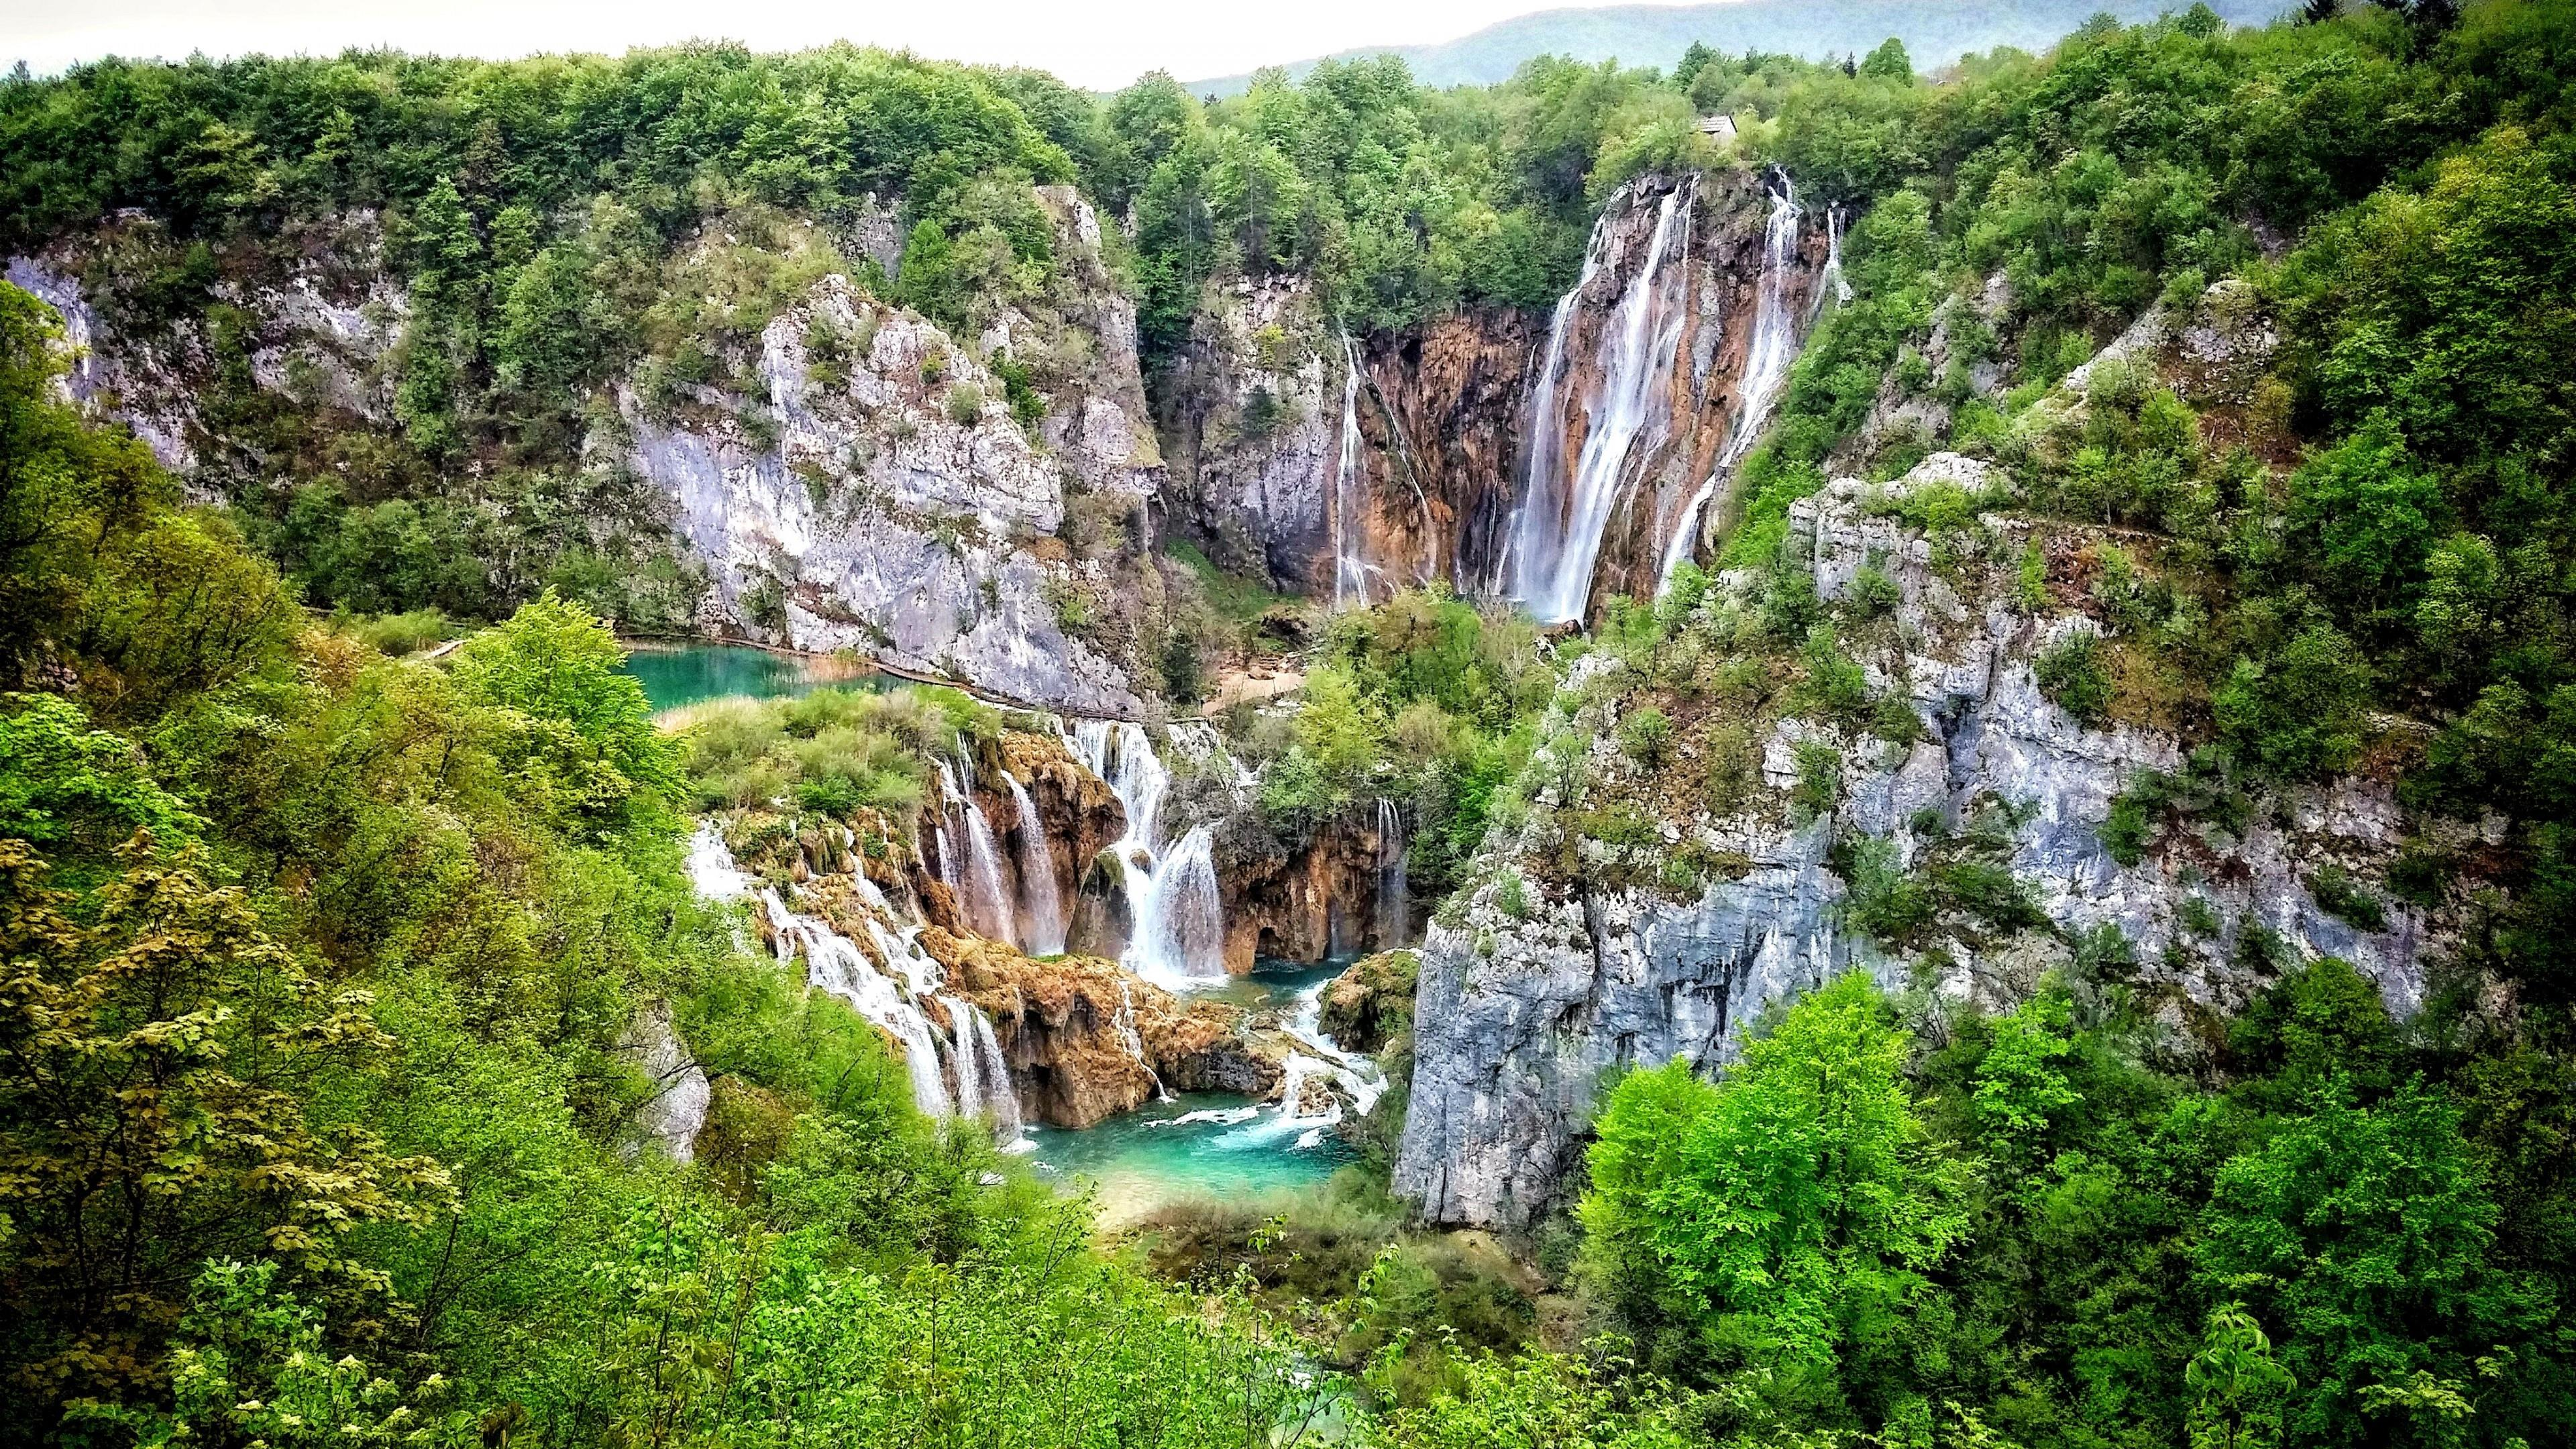 Waterfalls at Plitvice Lakes National Park ⛰️ wallpaper